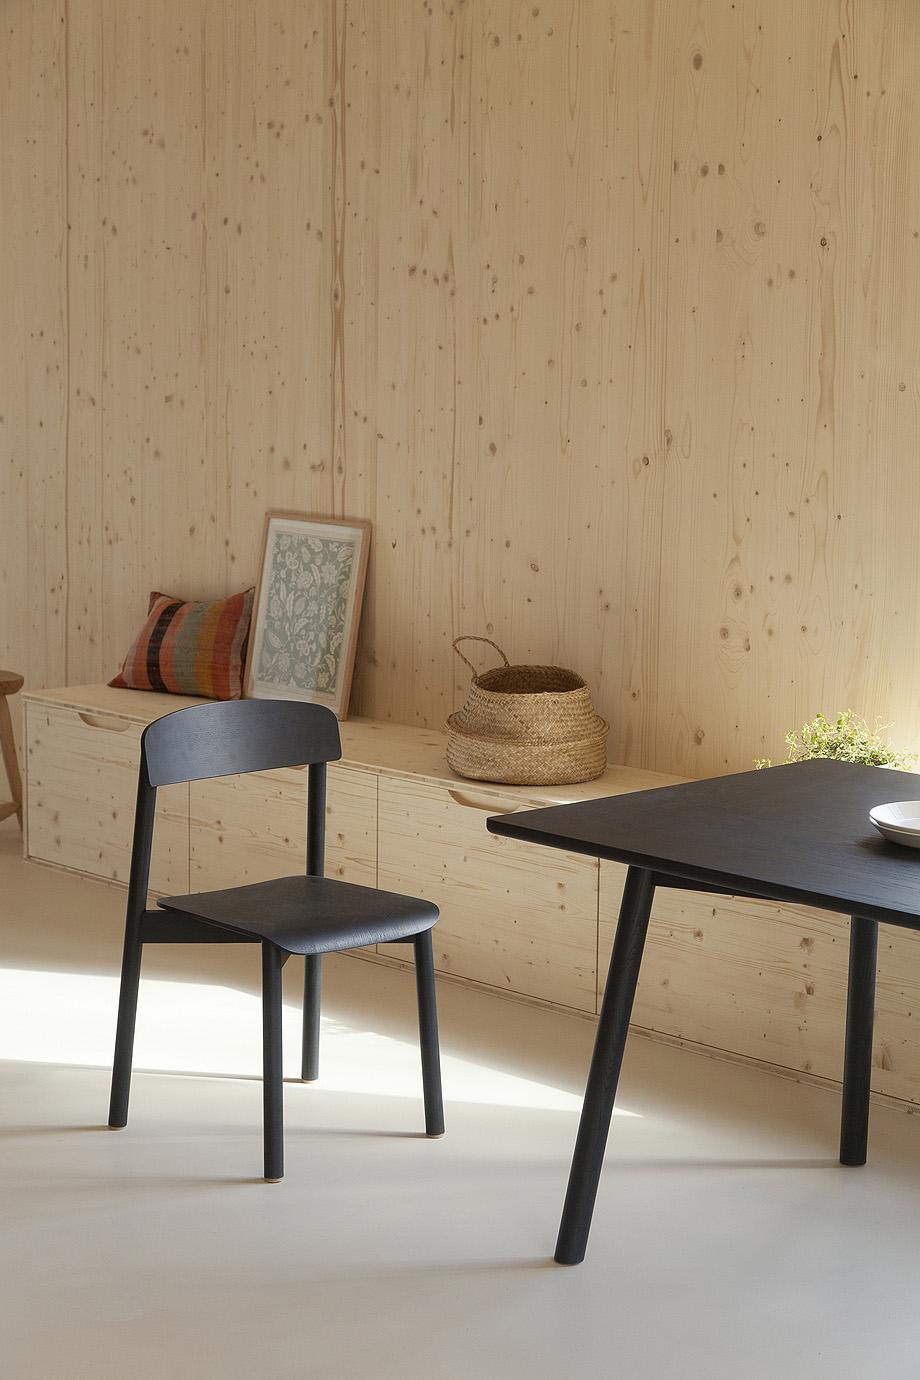 casa pasiva de atelier ordinaire - foto julien renault (20)